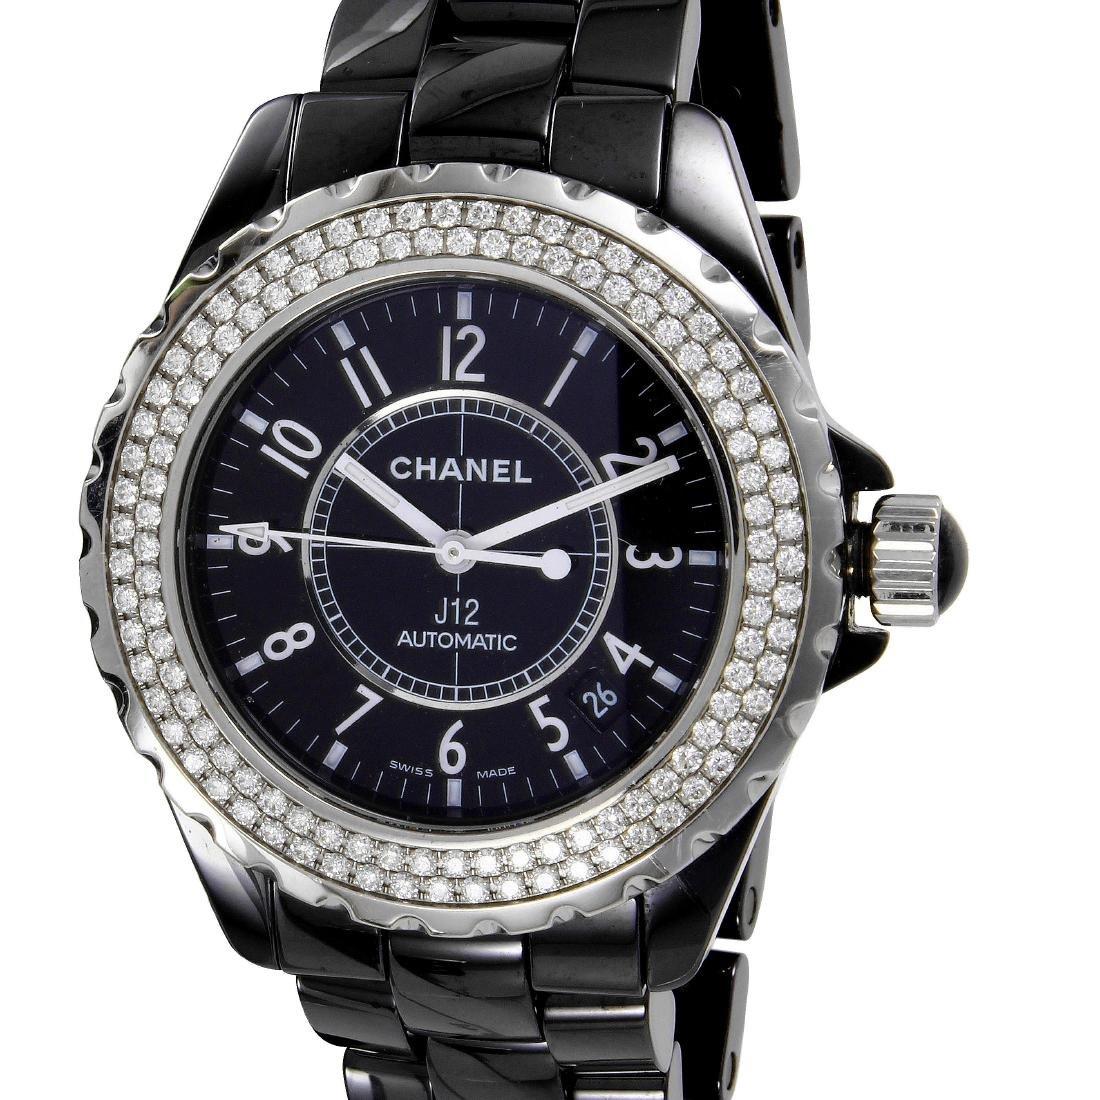 Chanel J12 Automatic Ceramic Diamond Watch